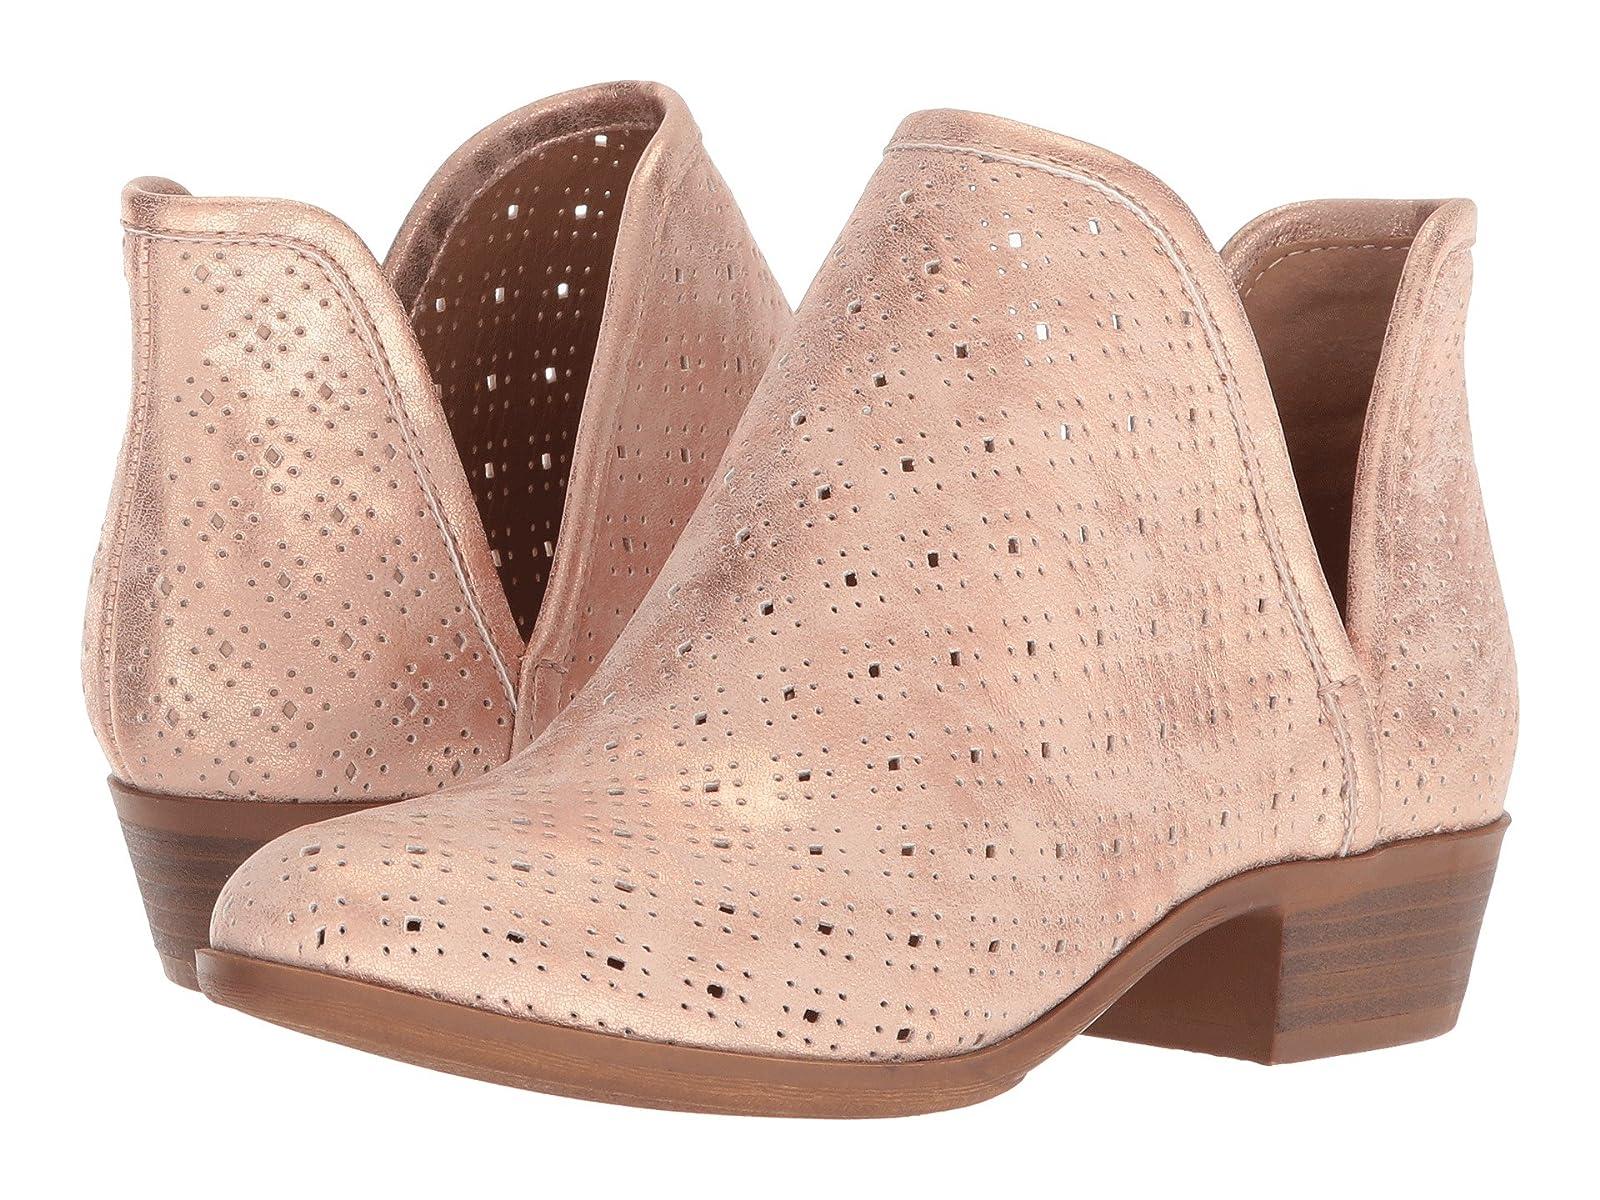 Lucky Brand Kids Bashina (Little Kid/Big Kid)Cheap and distinctive eye-catching shoes